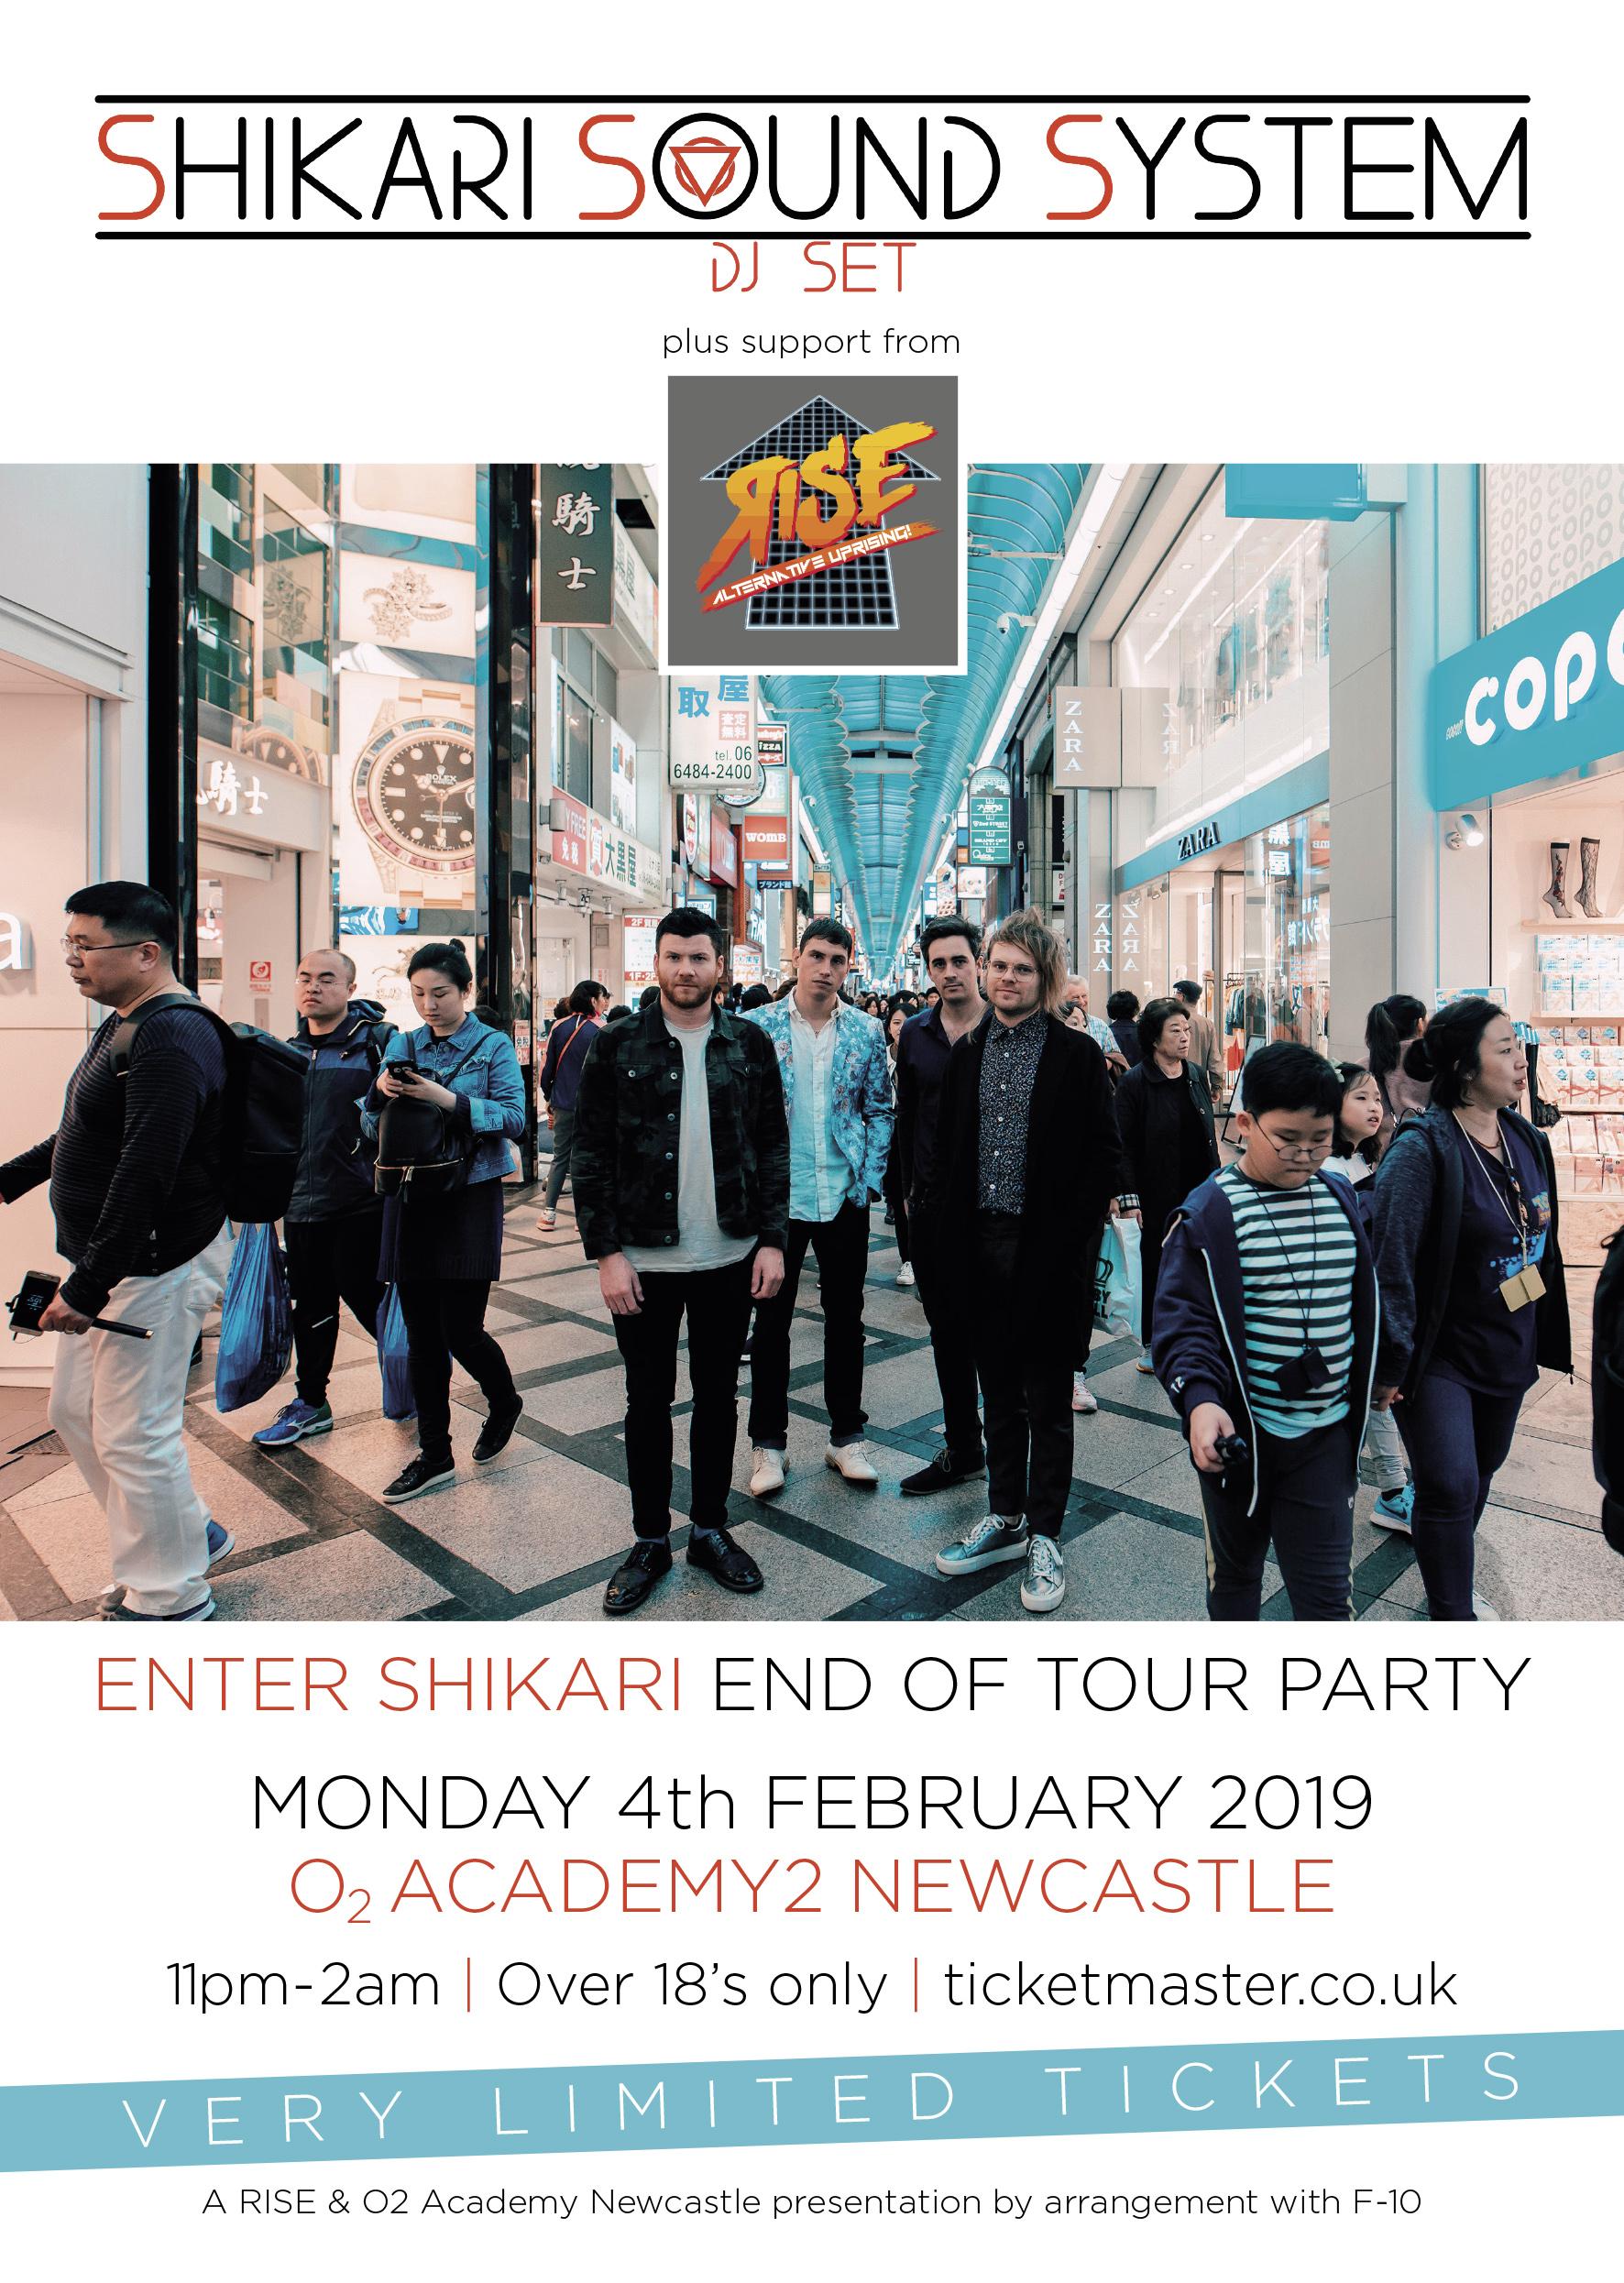 Shikari Sound System DJ Set at O2 Academy Newcastle, Newcastle Upon